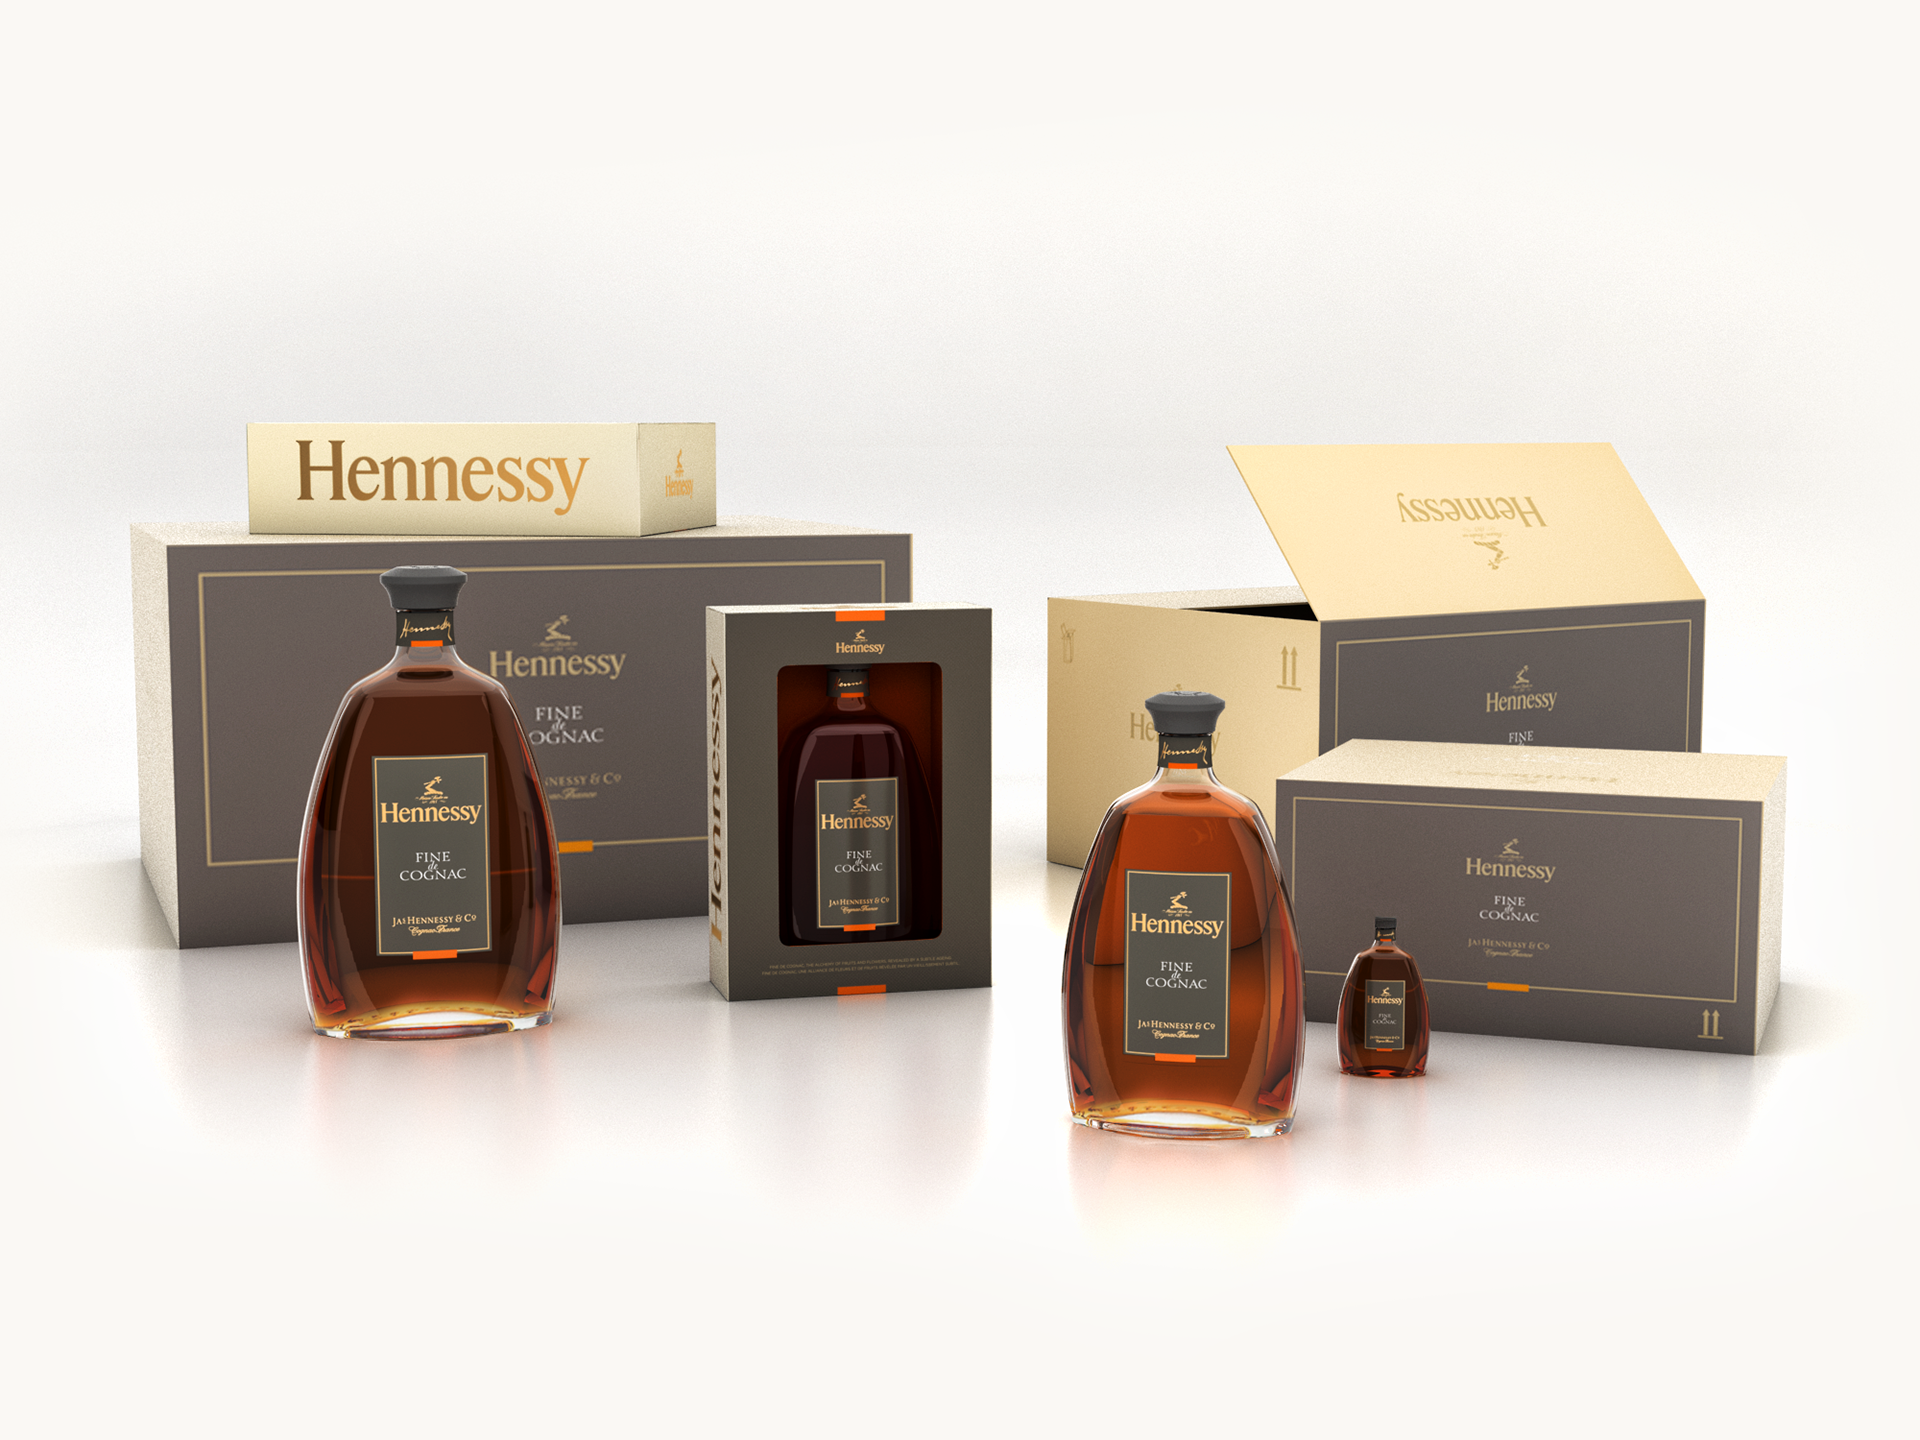 Gamme Fine de Cognac